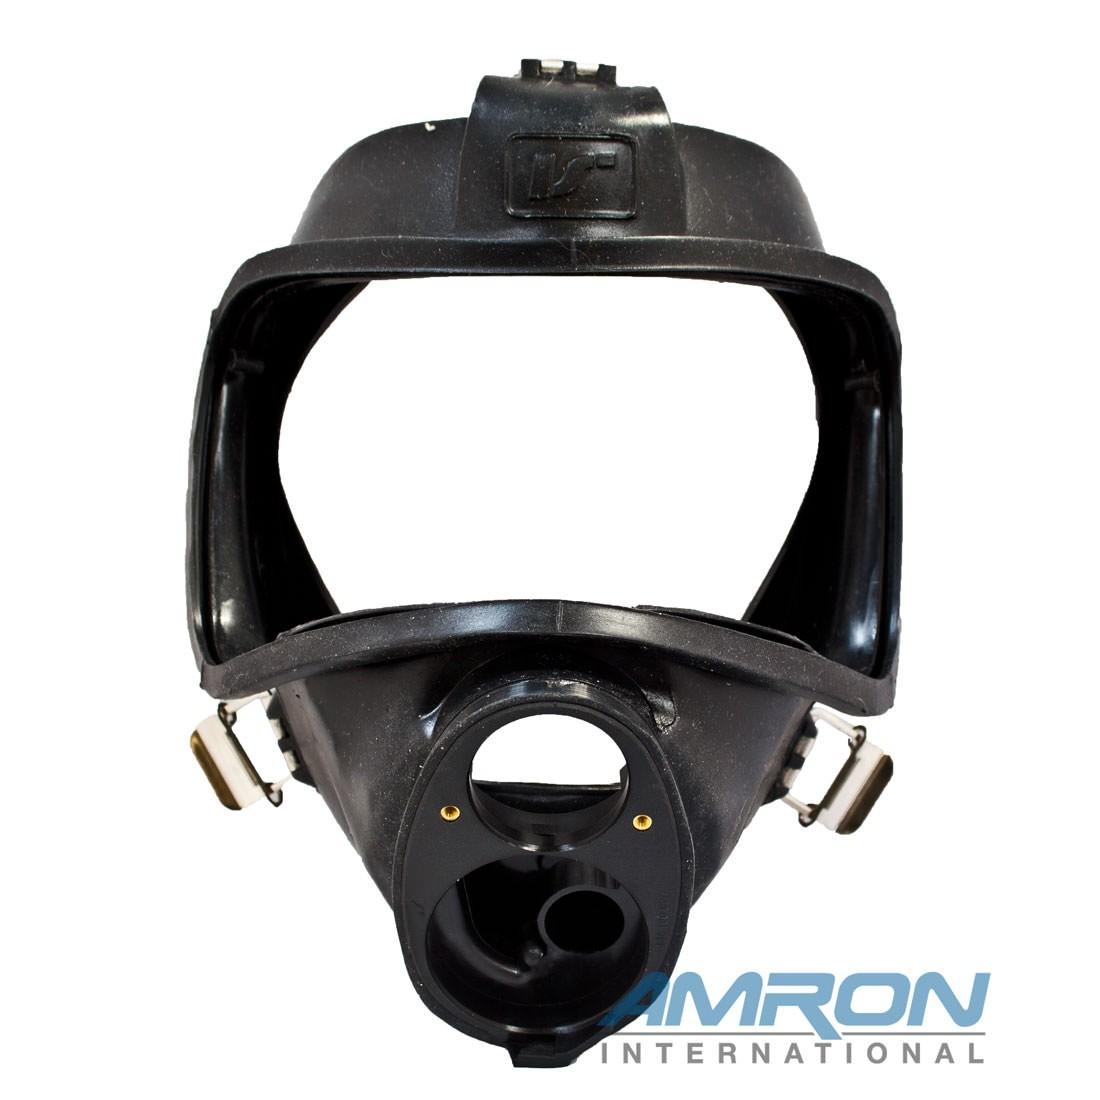 Interspiro AGA 460-190-544 Mask Body Assembly - Black Silicone